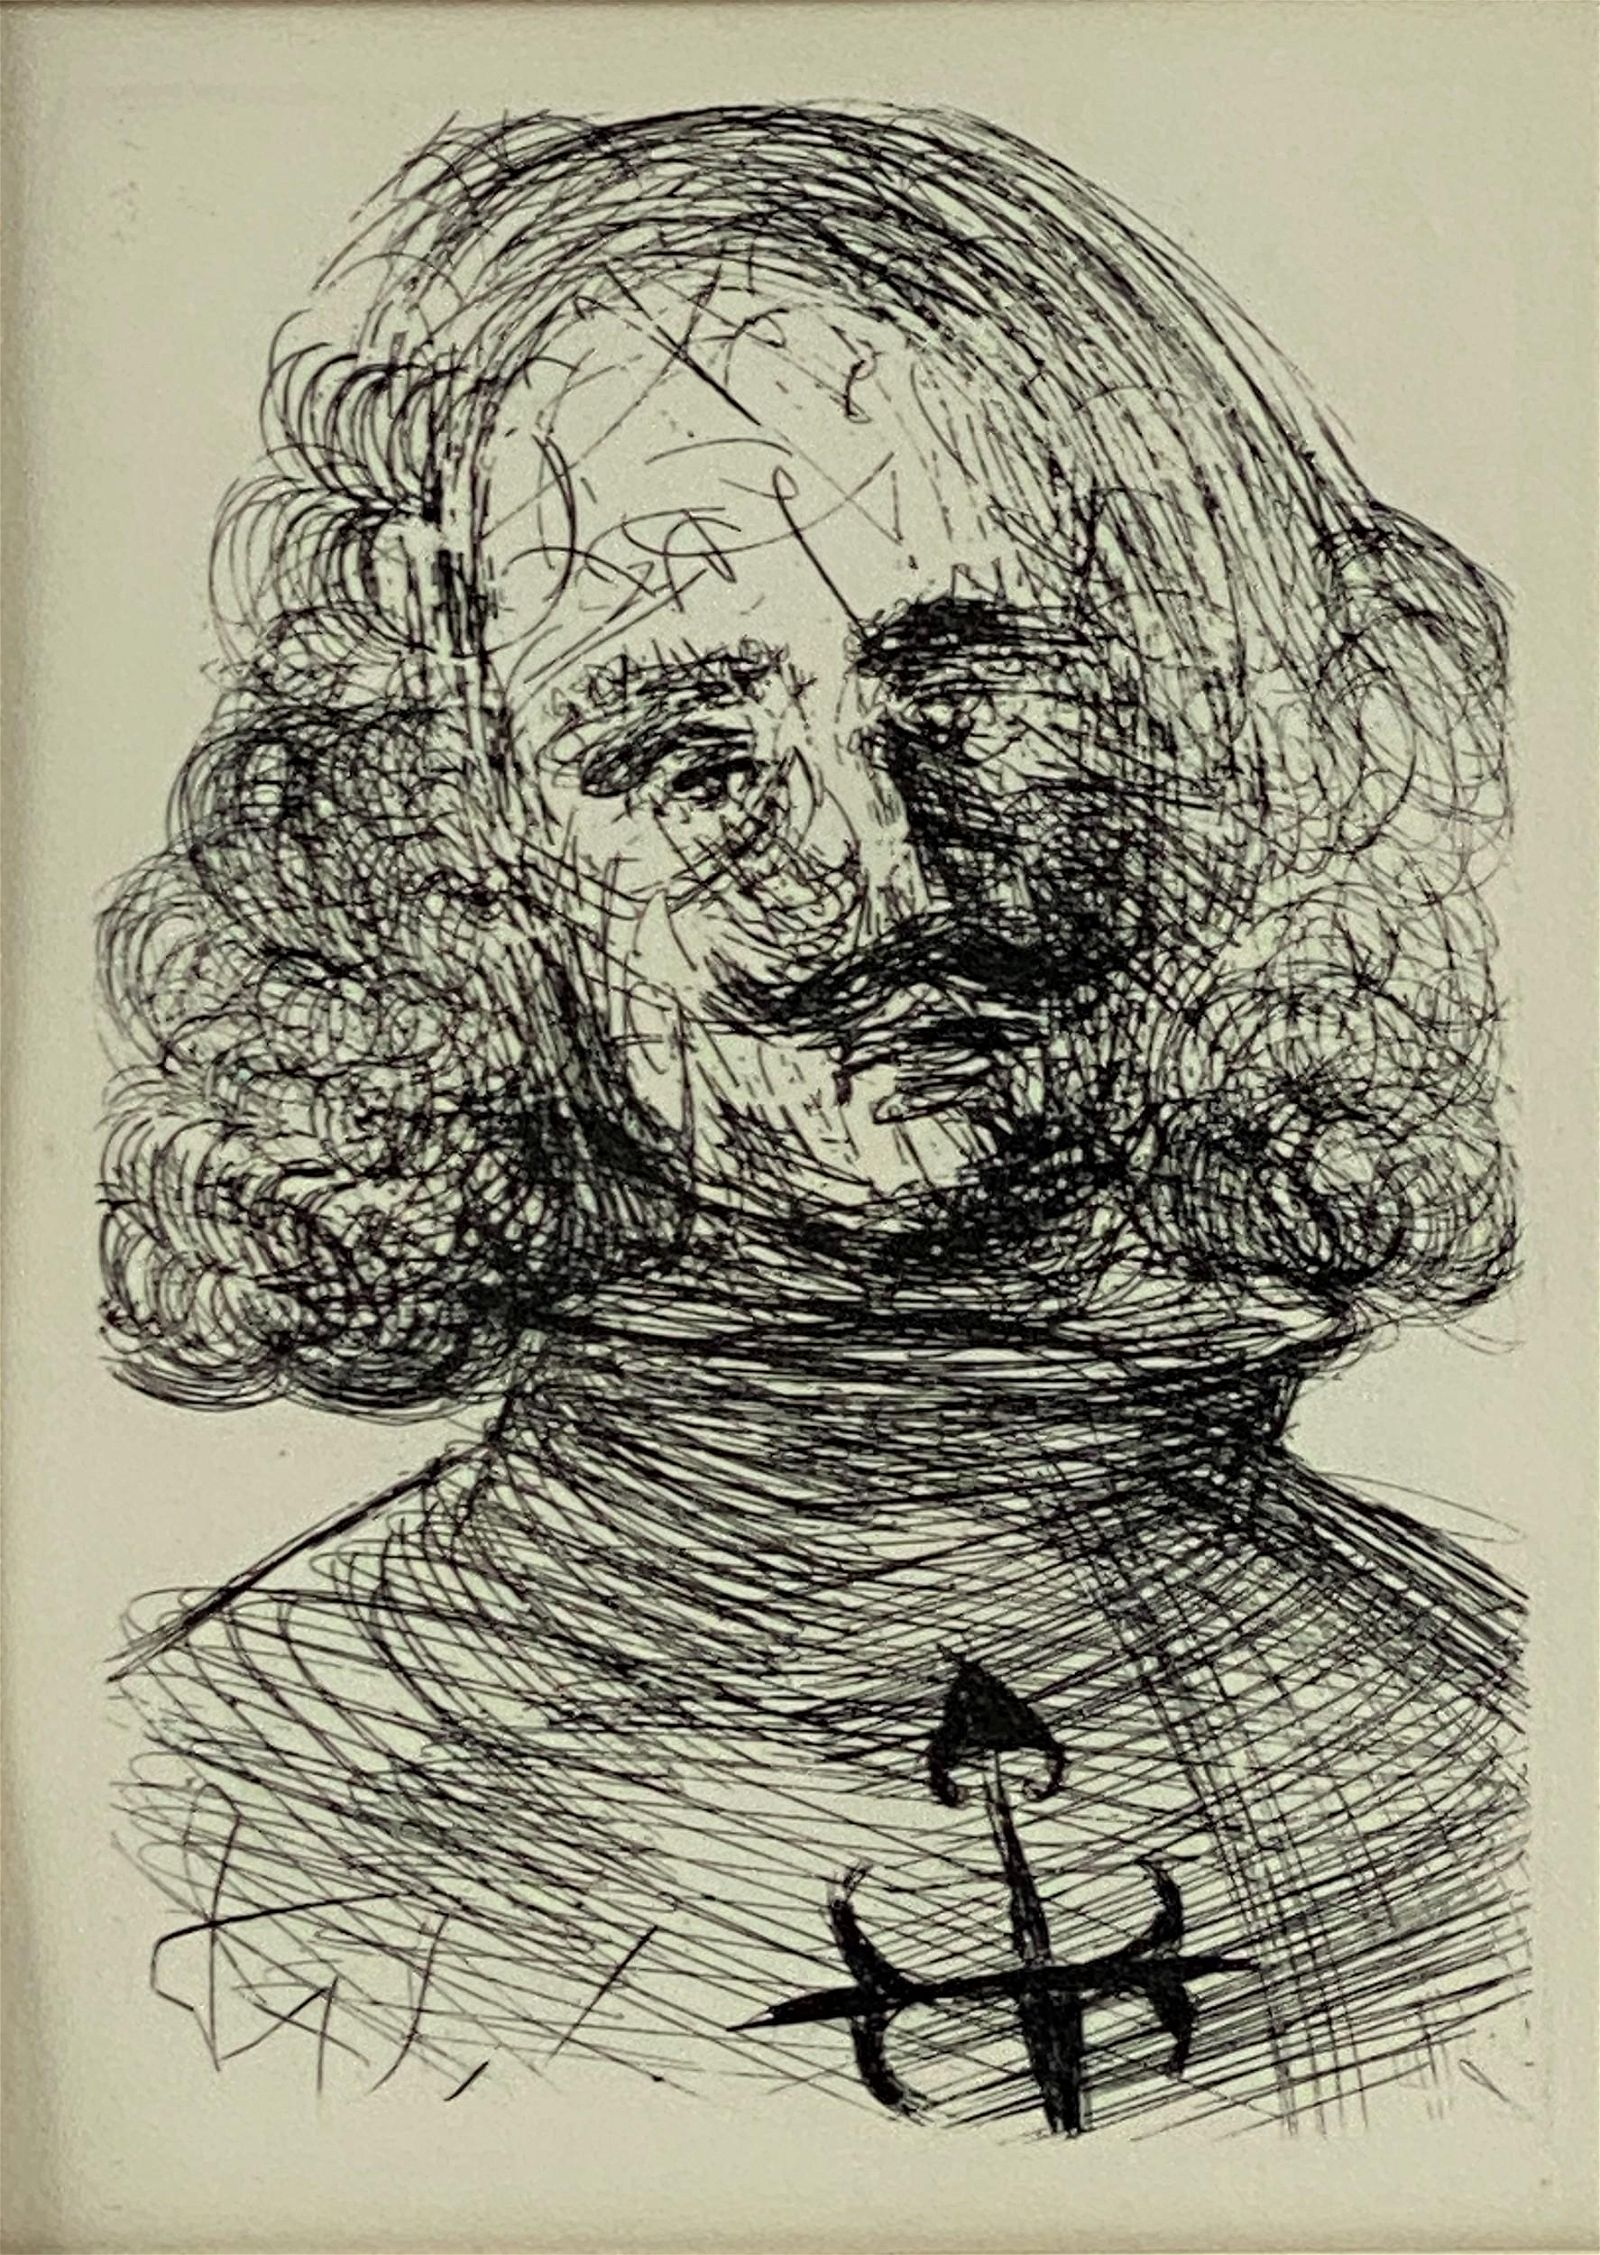 Salvador Dali (Spanish, 1904-1989), Etching of